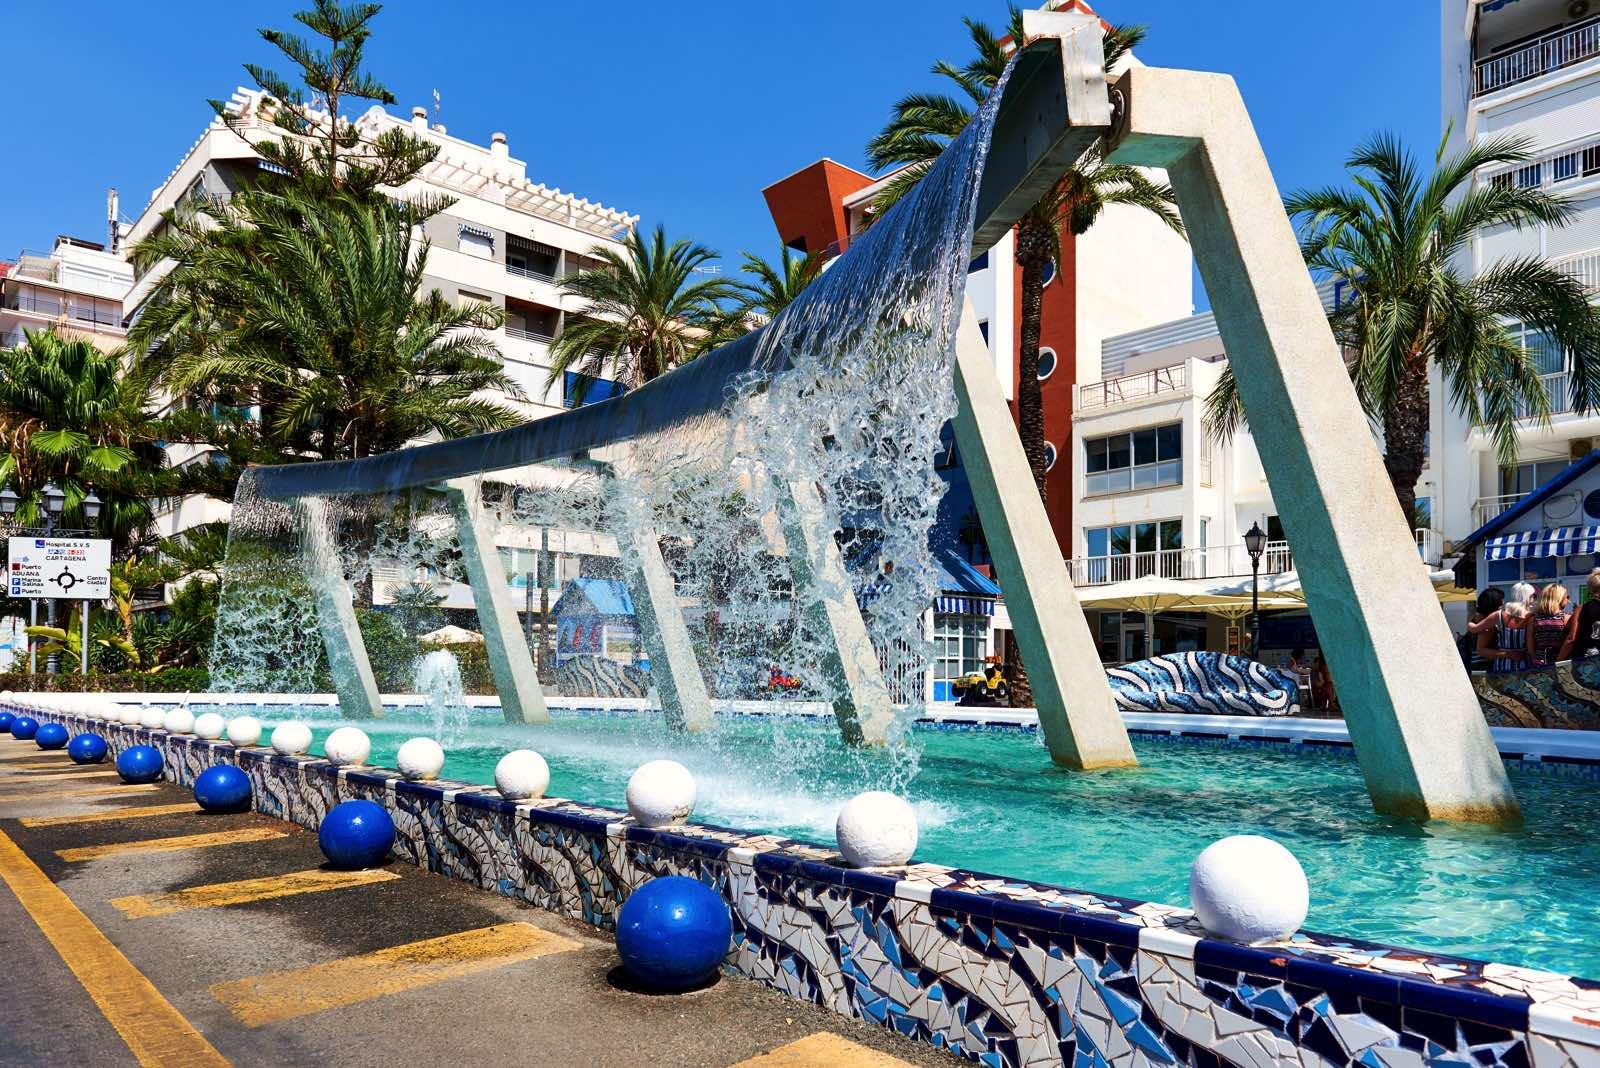 Torrevieja (Alicante)